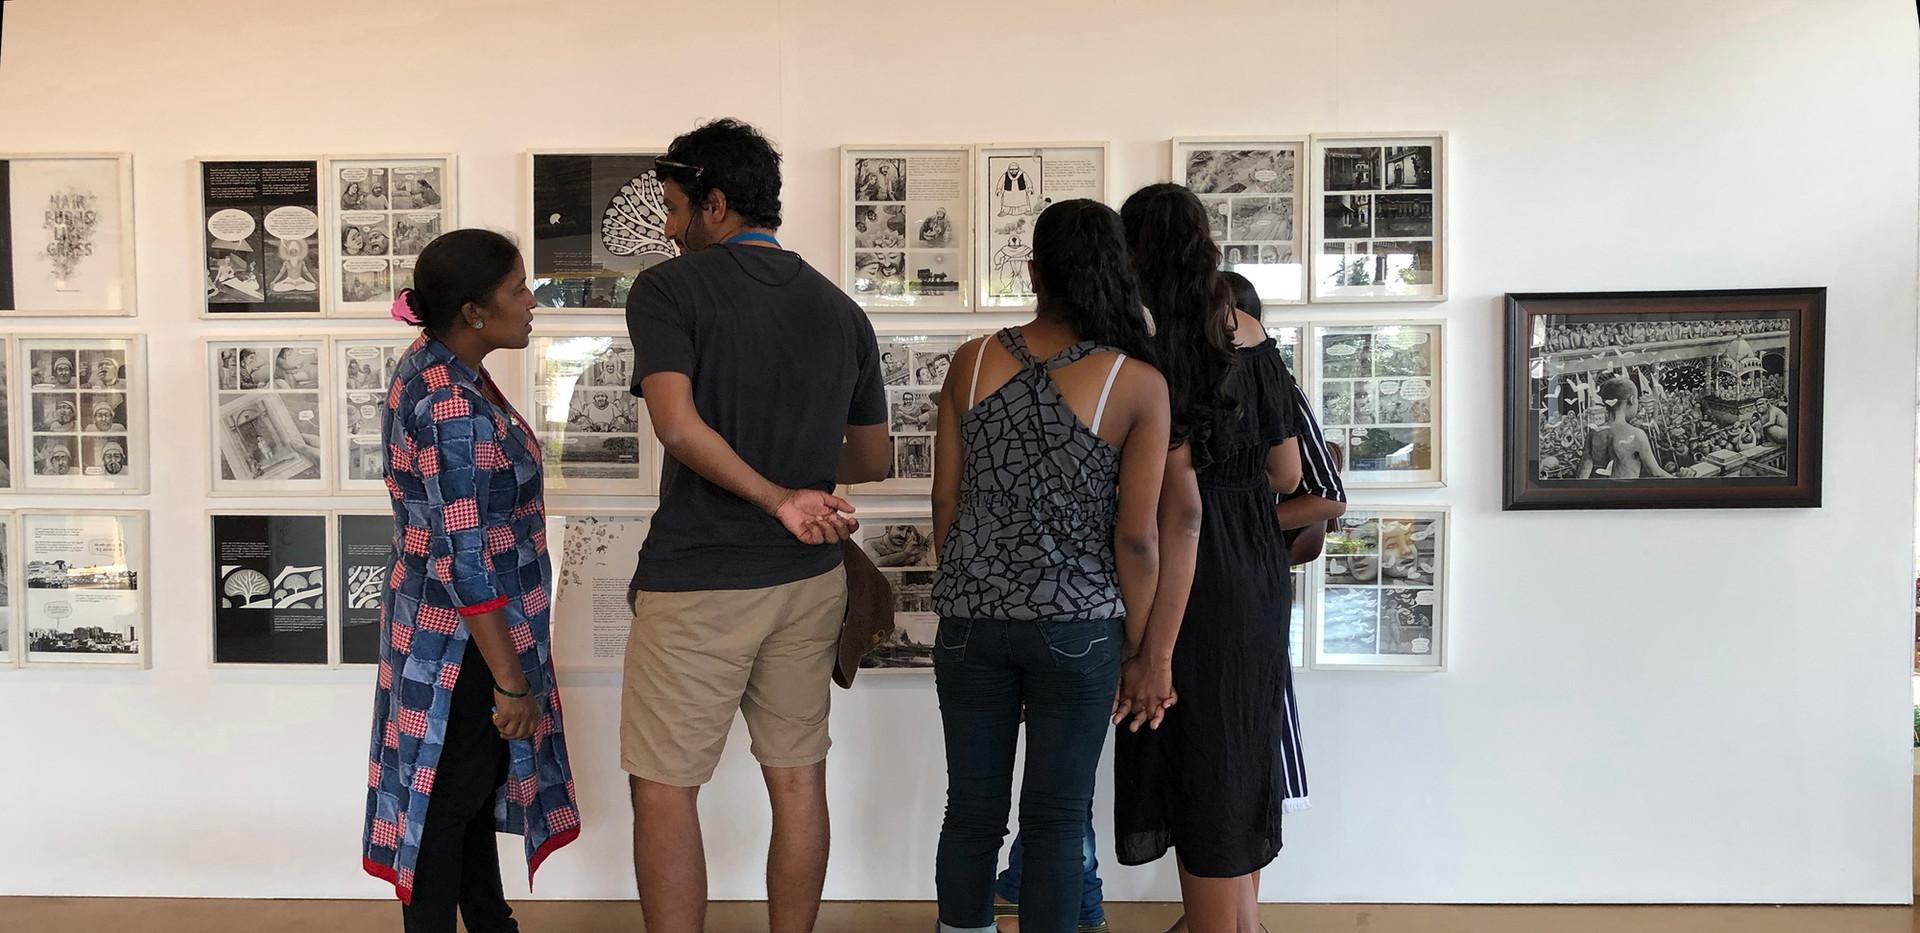 Visitors at the Art Pavilion